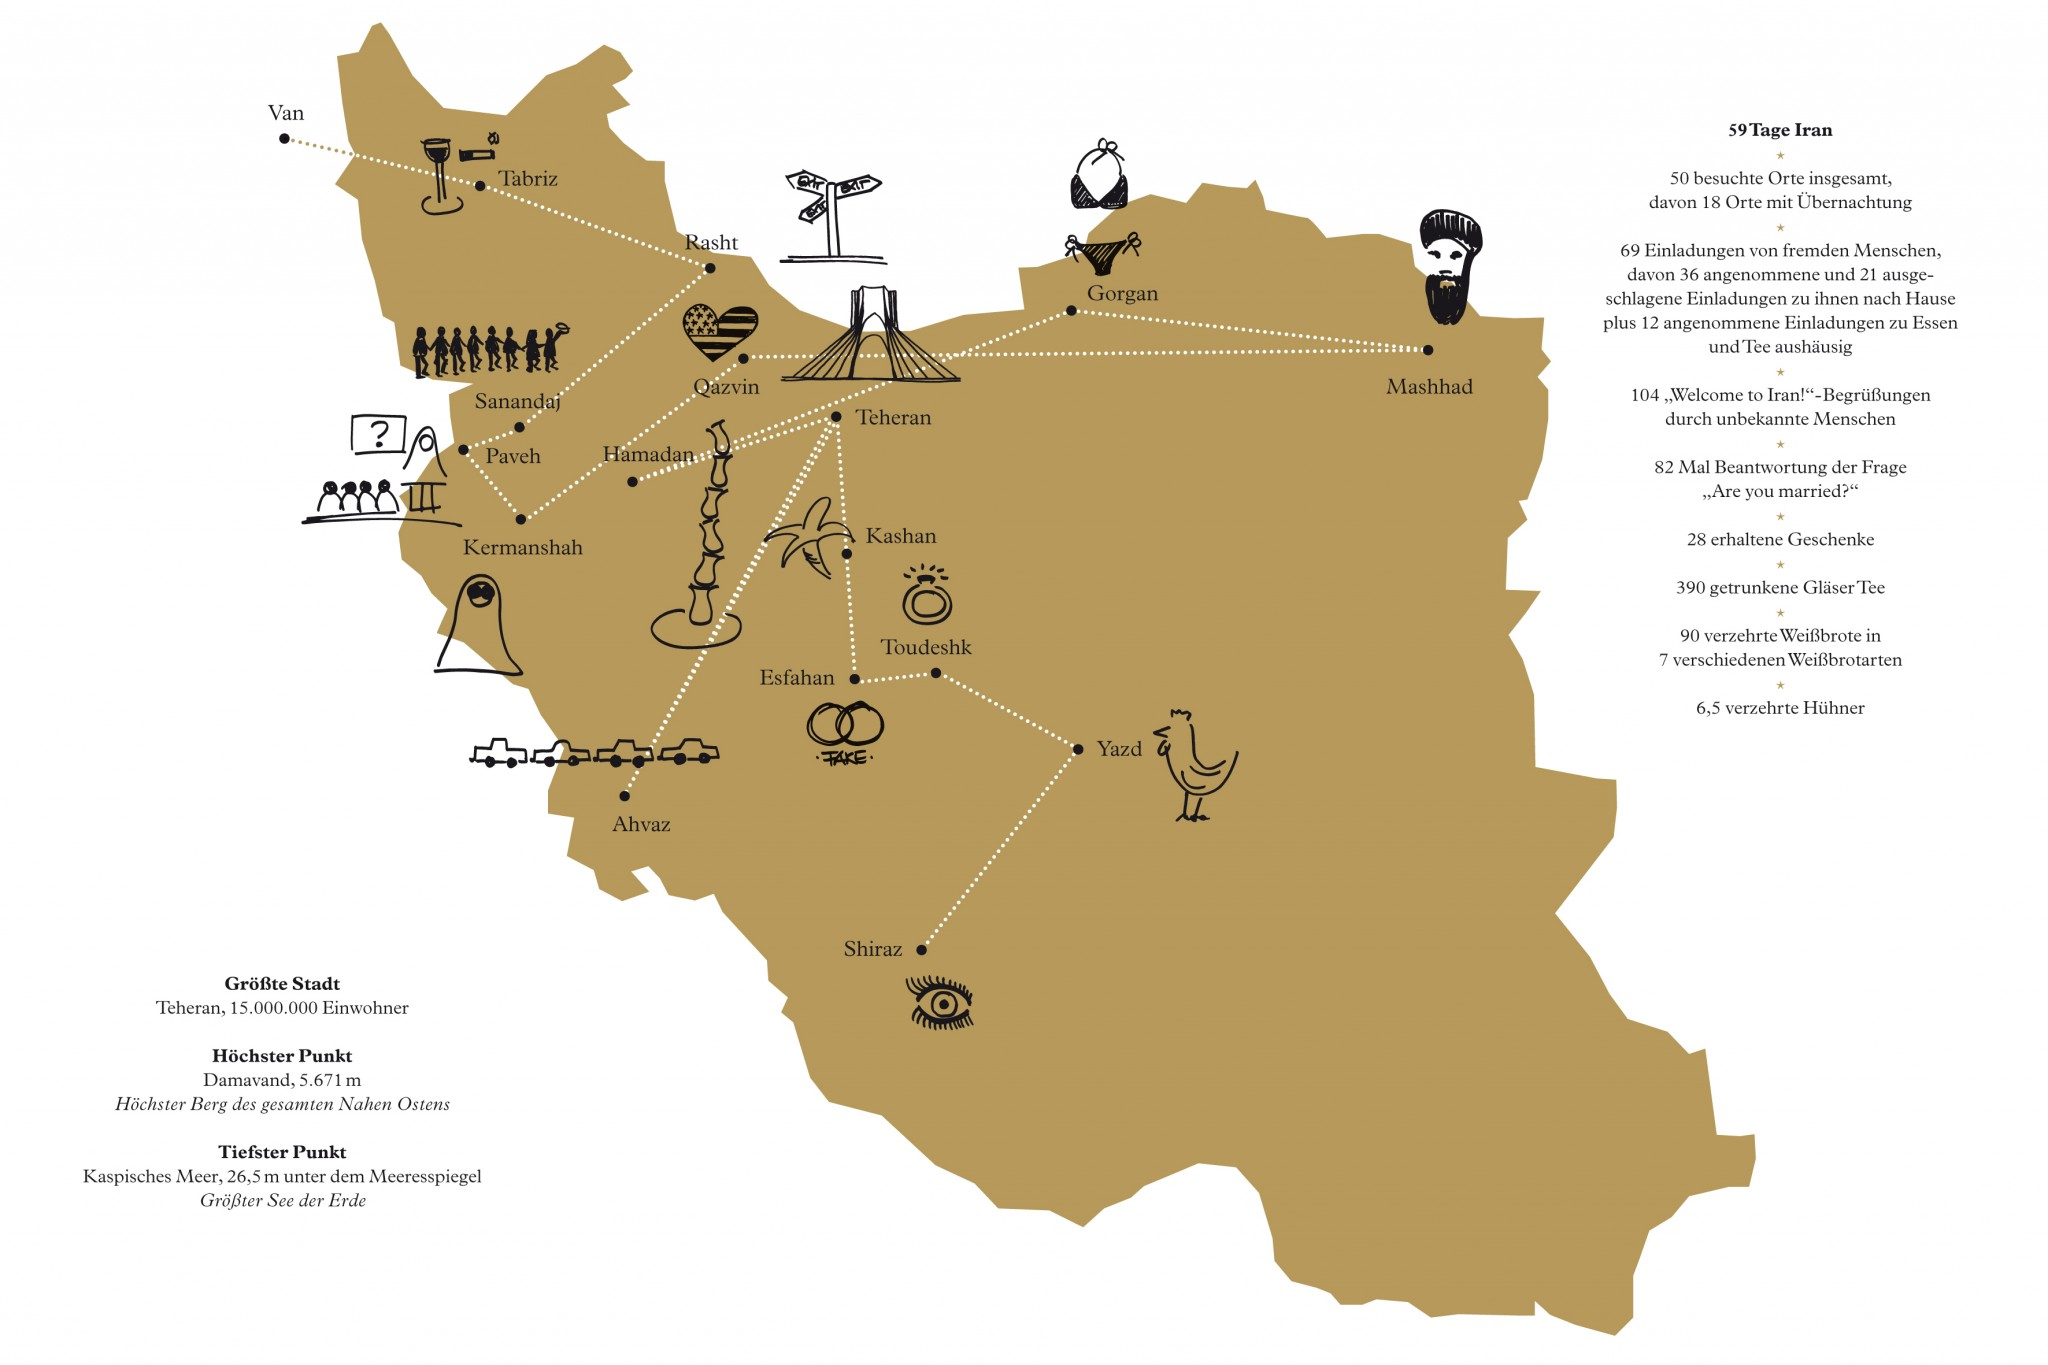 59 Tage Iran